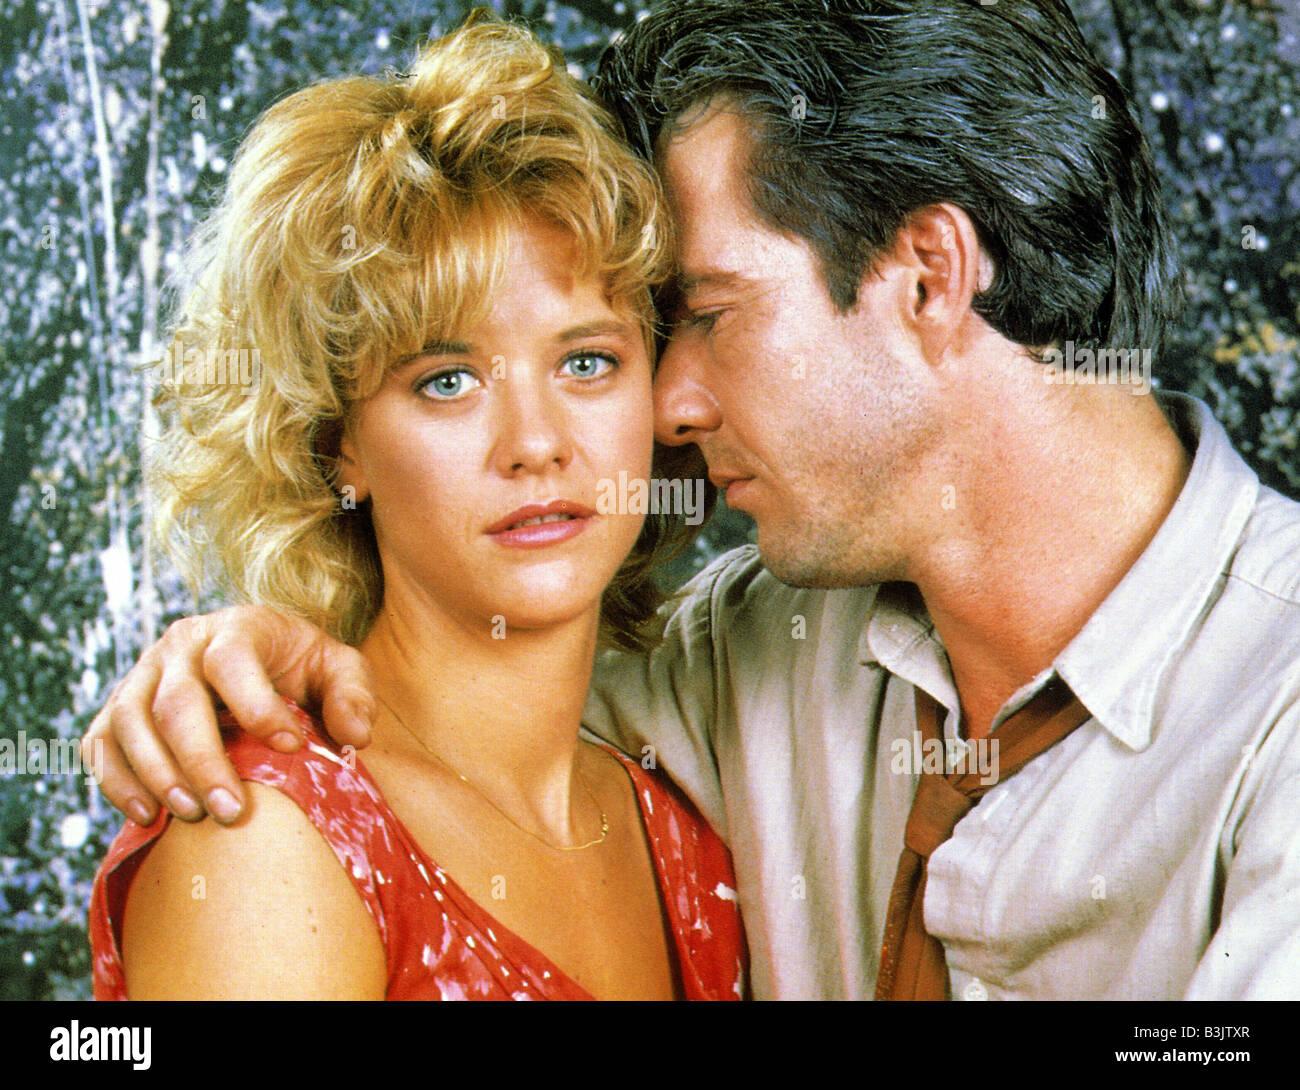 DOA 1988 Warner Film With Dennis Quaid And Meg Ryan